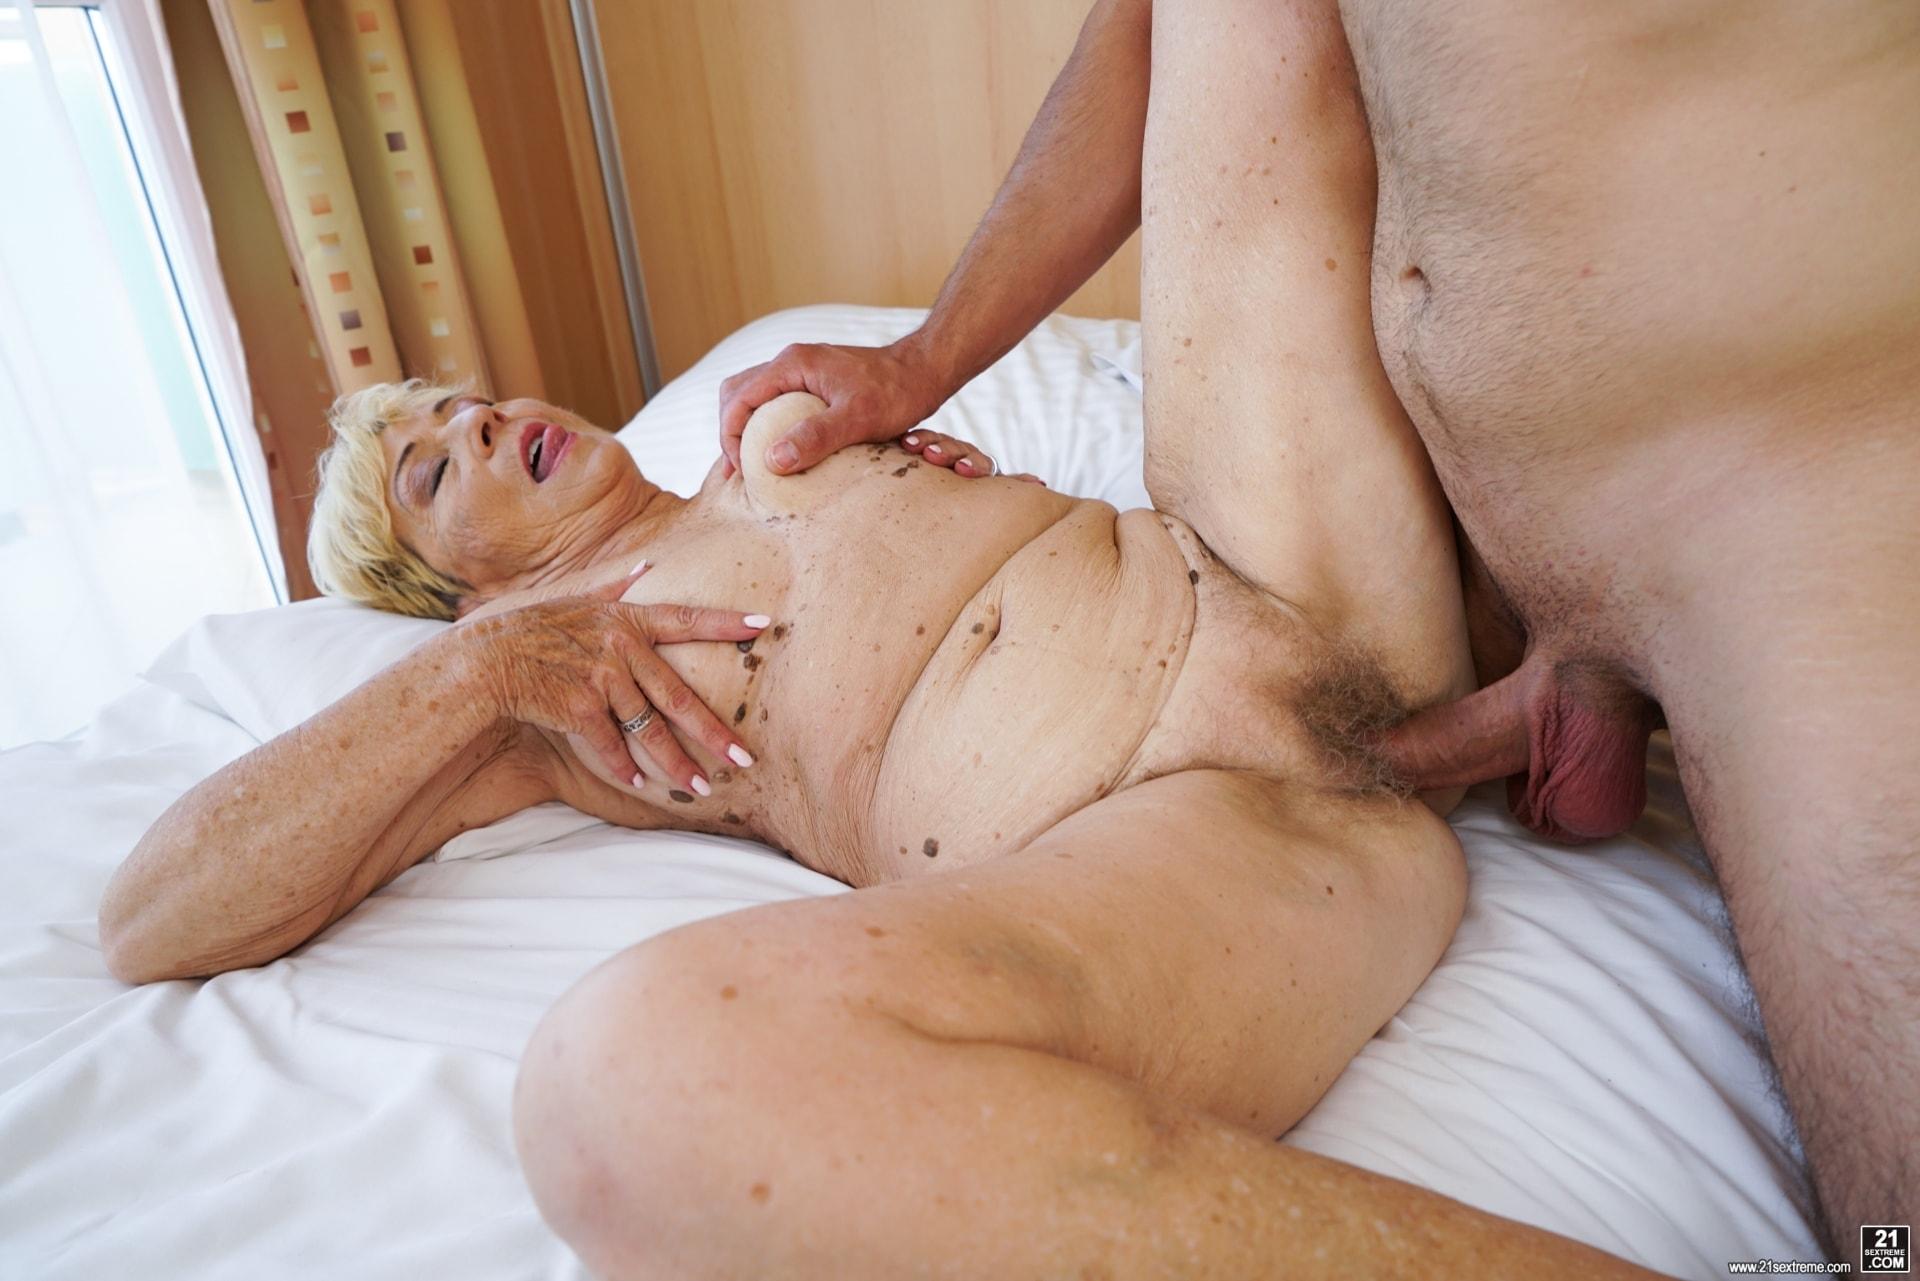 21Sextury 'Old Passion' starring Malya (Photo 99)